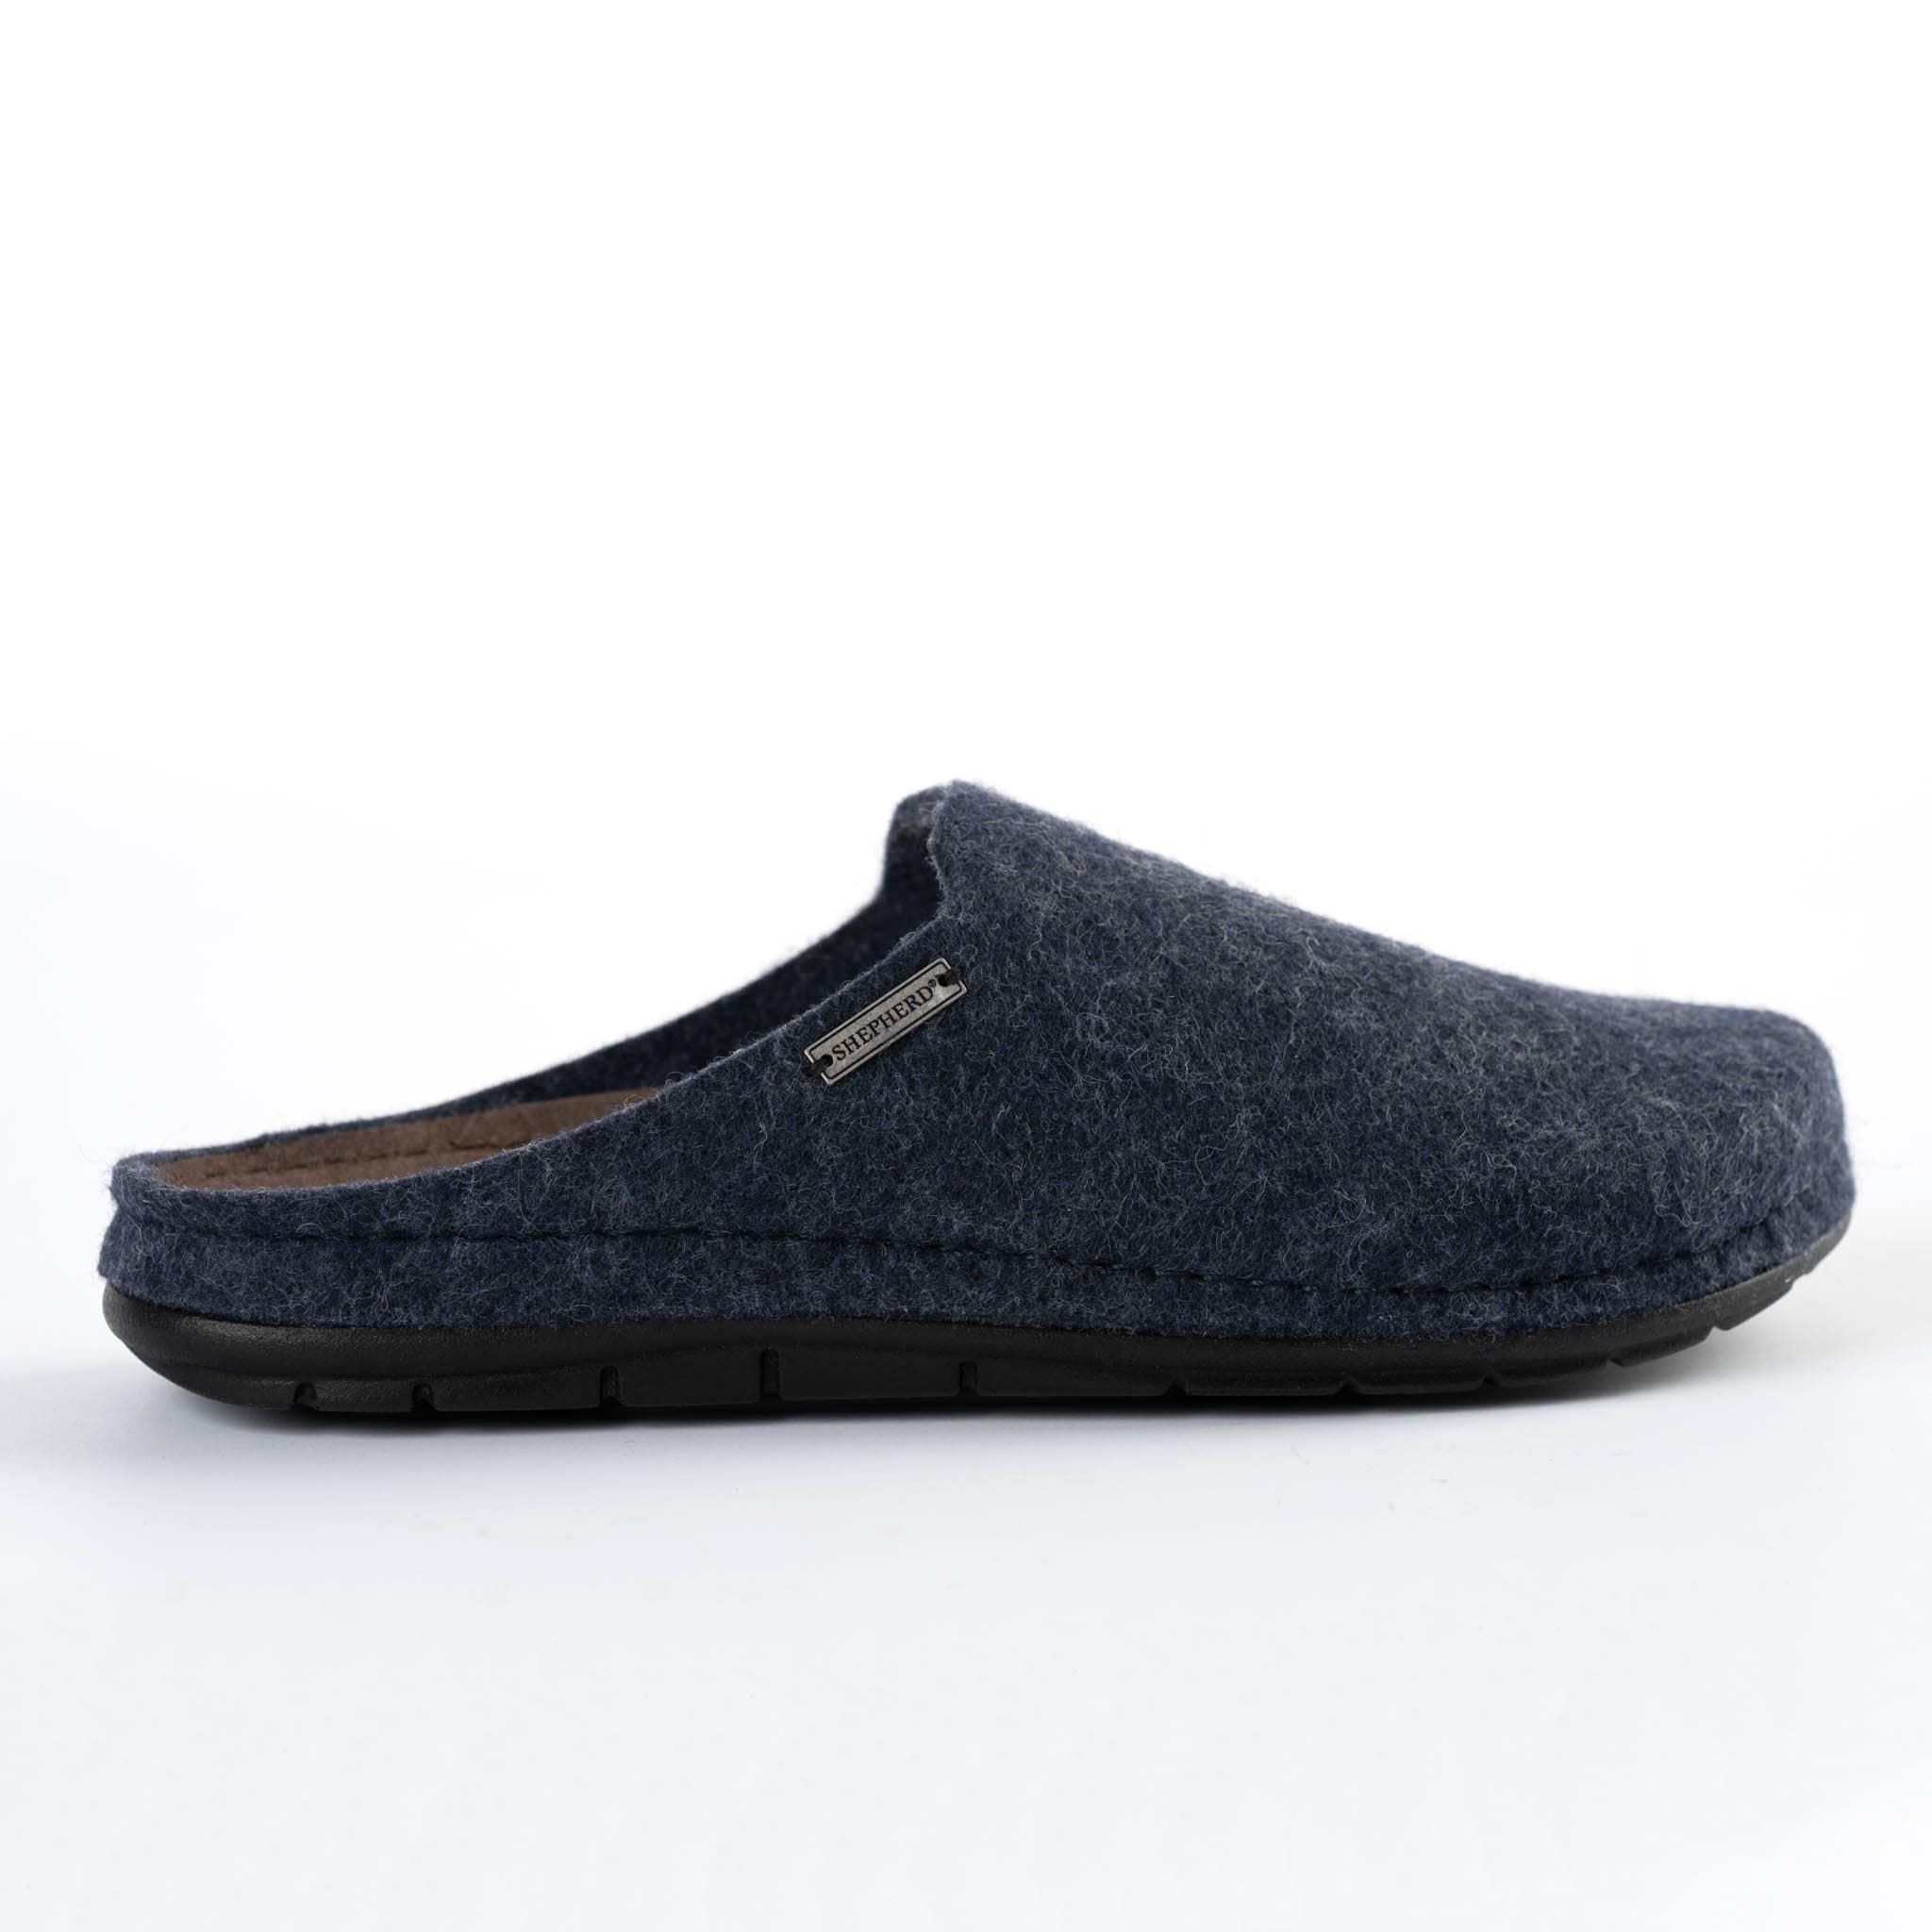 Shepherd Samuel wool slippers